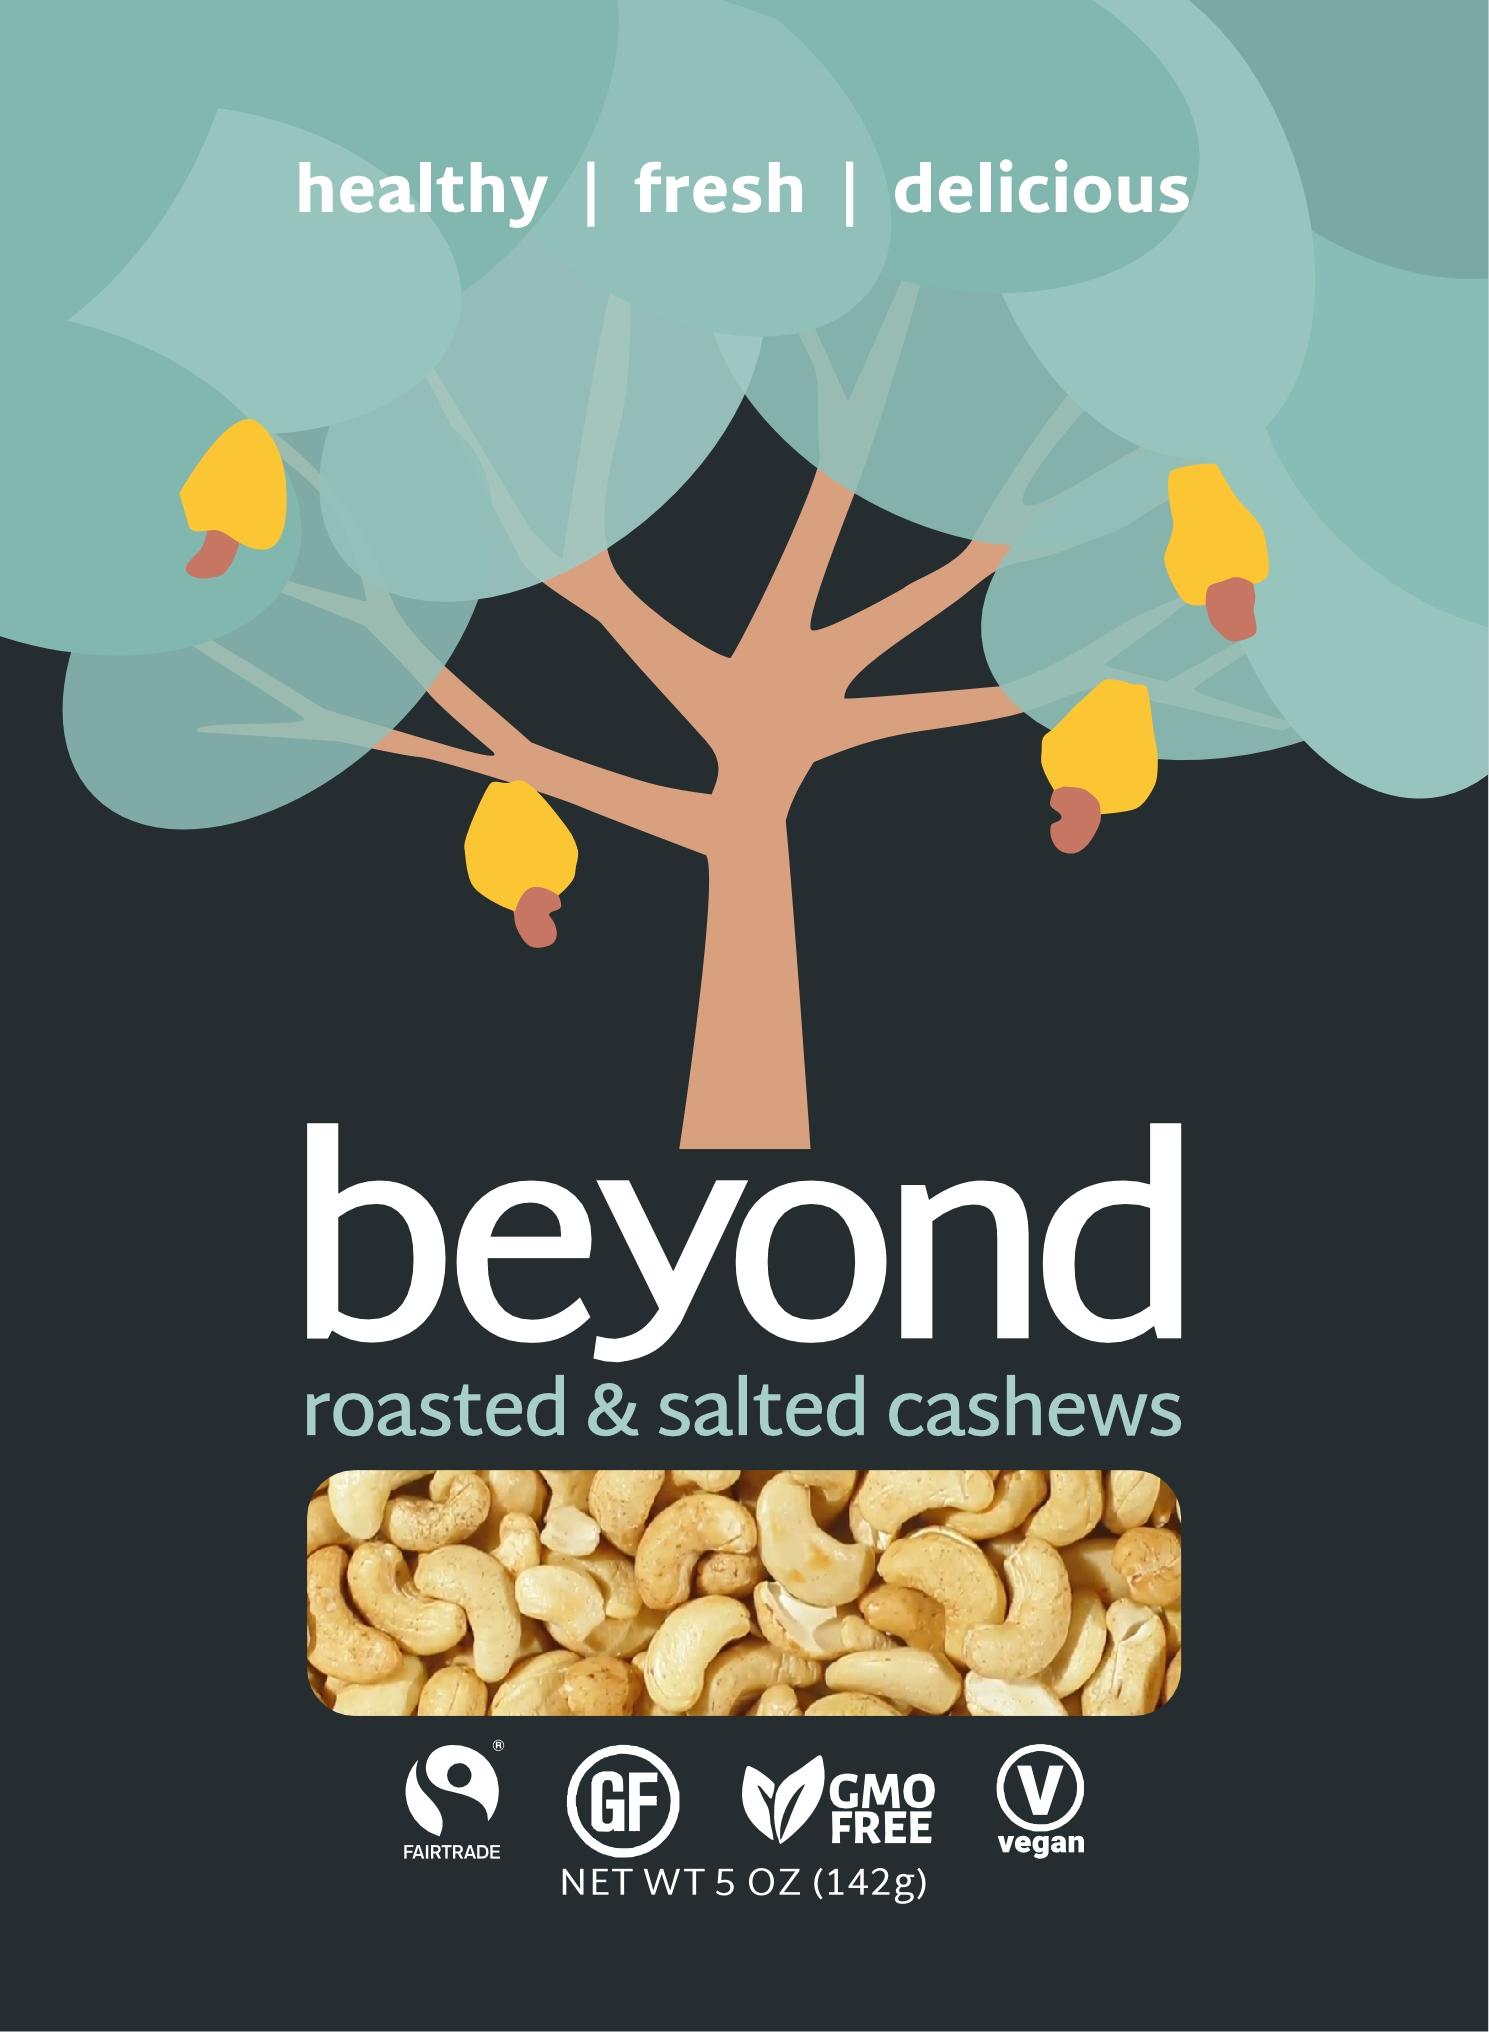 cashew package with cashew.jpg